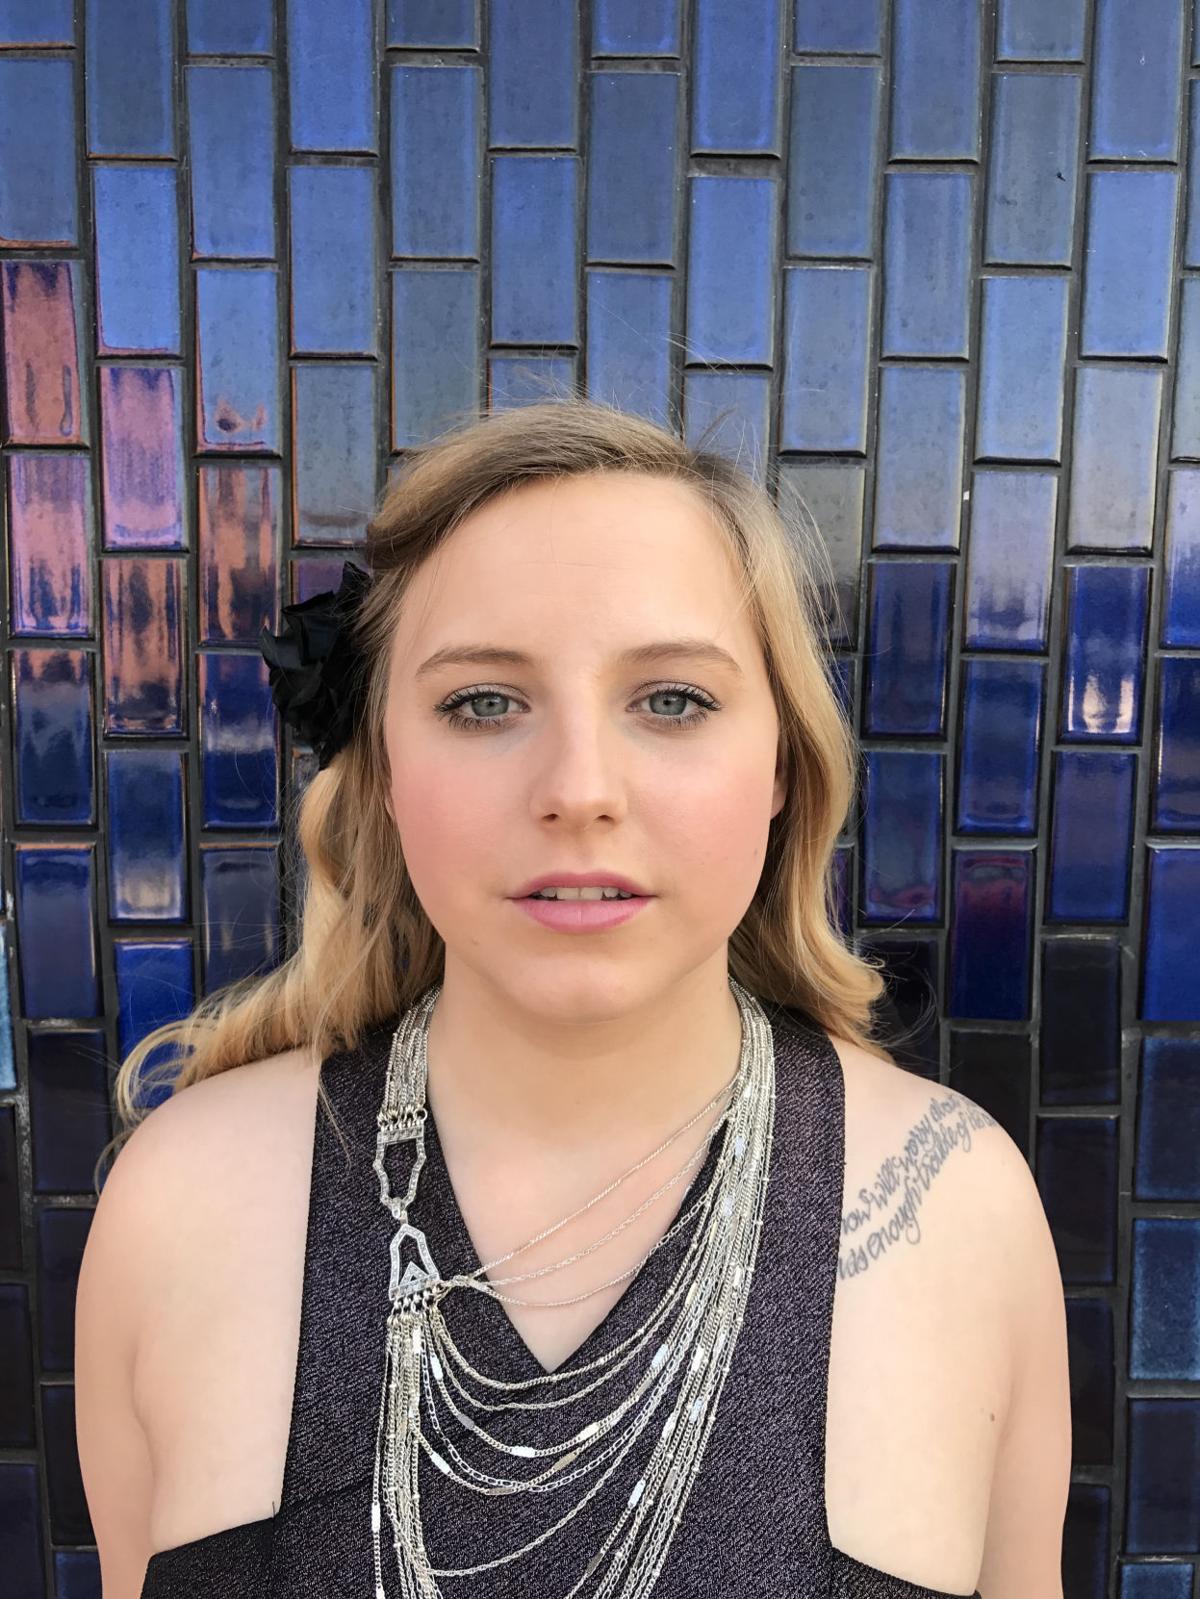 Hannah Dimolfetto